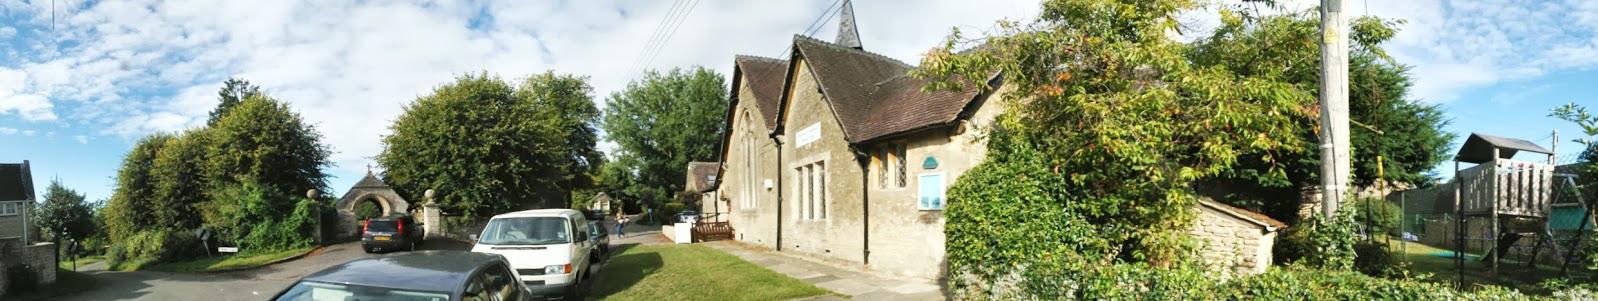 village-hall301